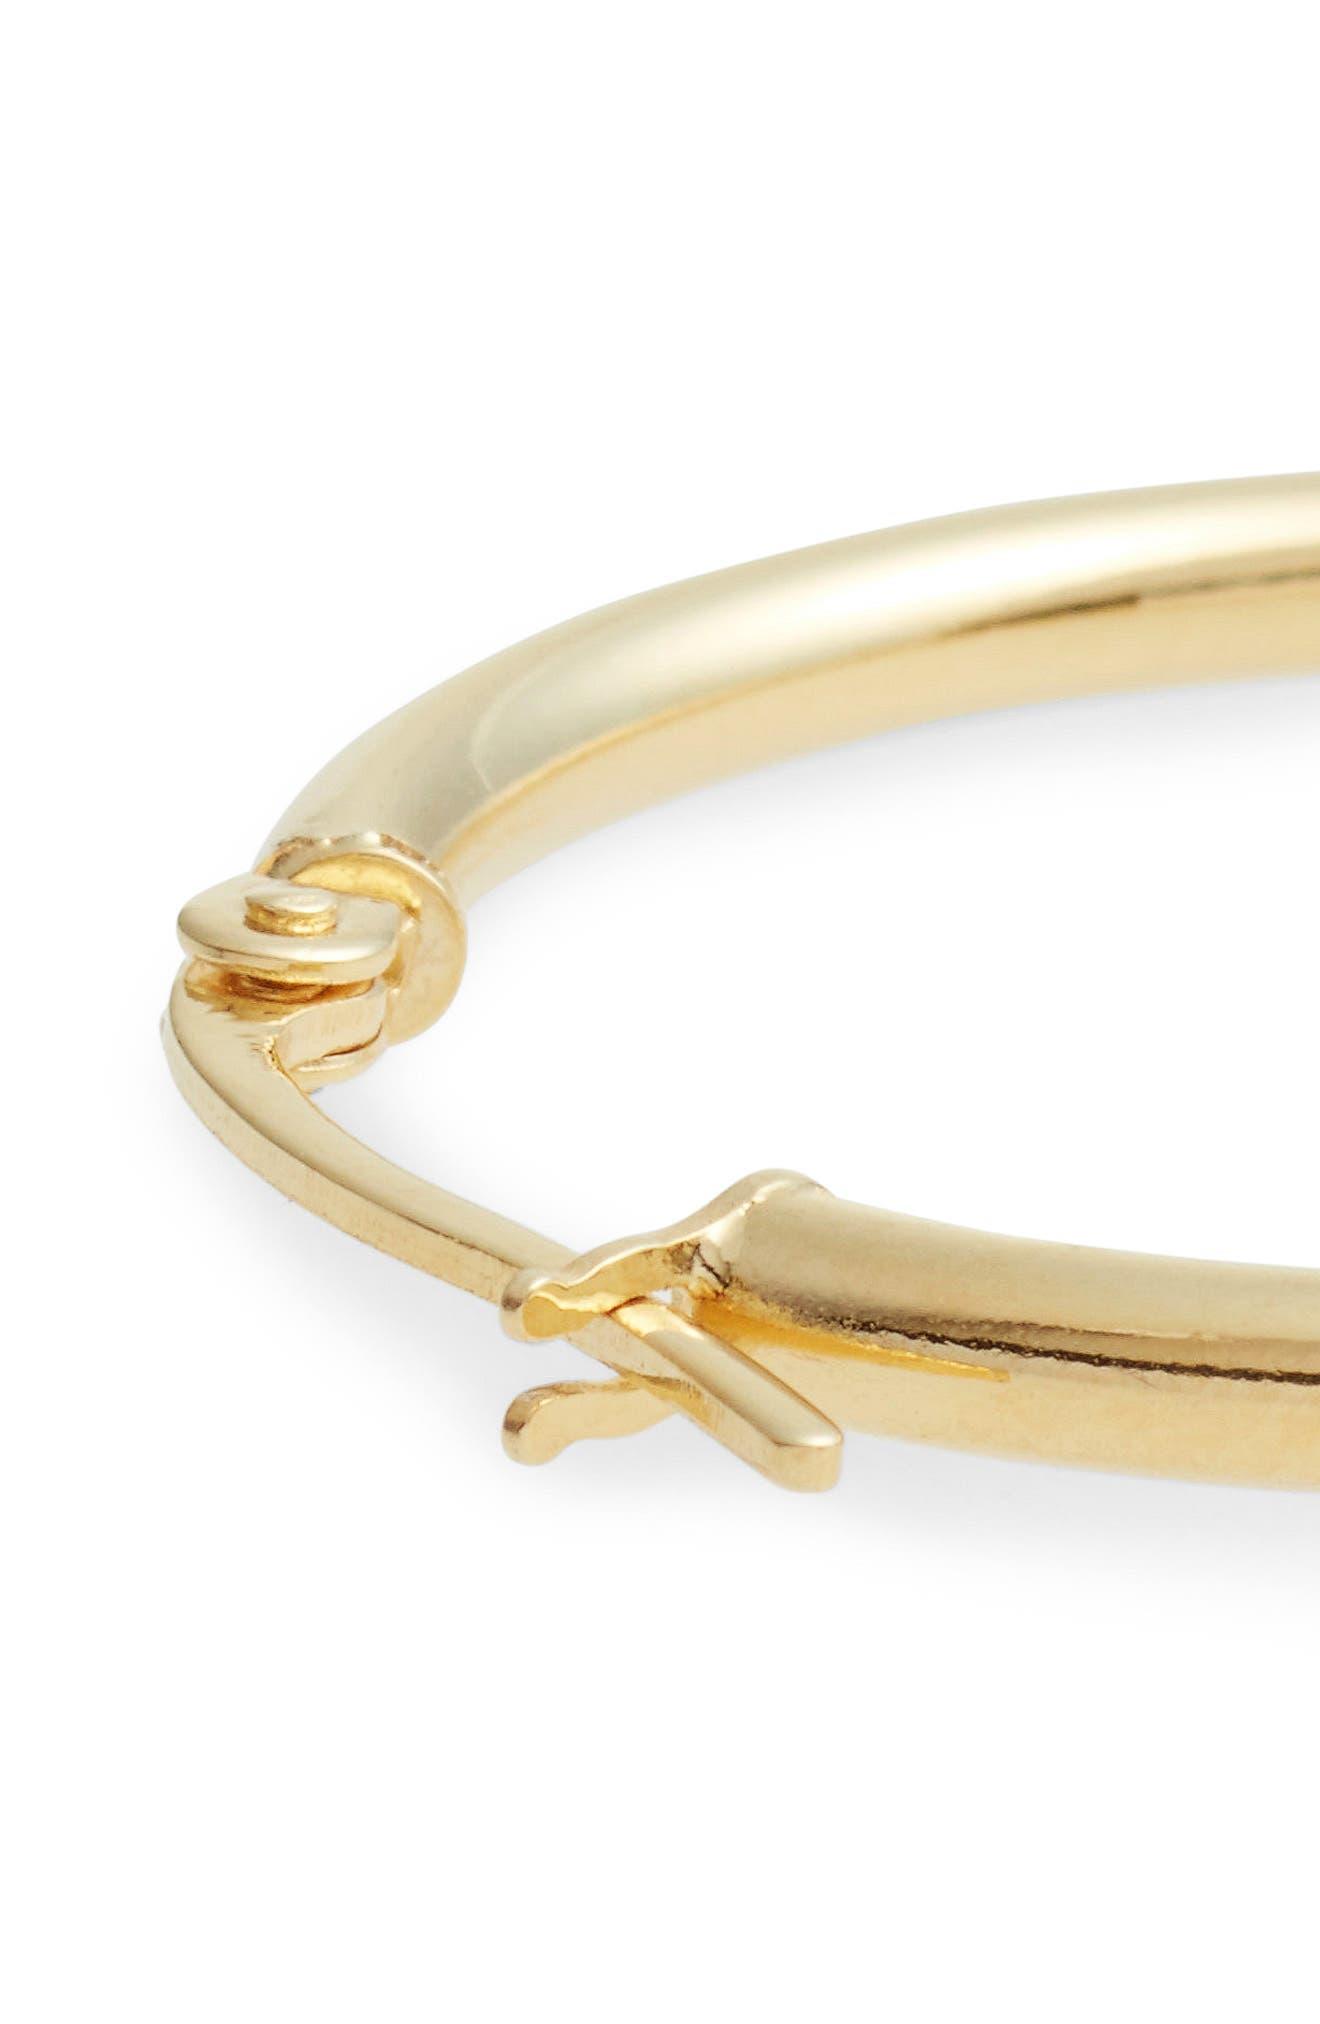 14k Gold Hoop Earrings,                             Alternate thumbnail 6, color,                             YELLOW GOLD